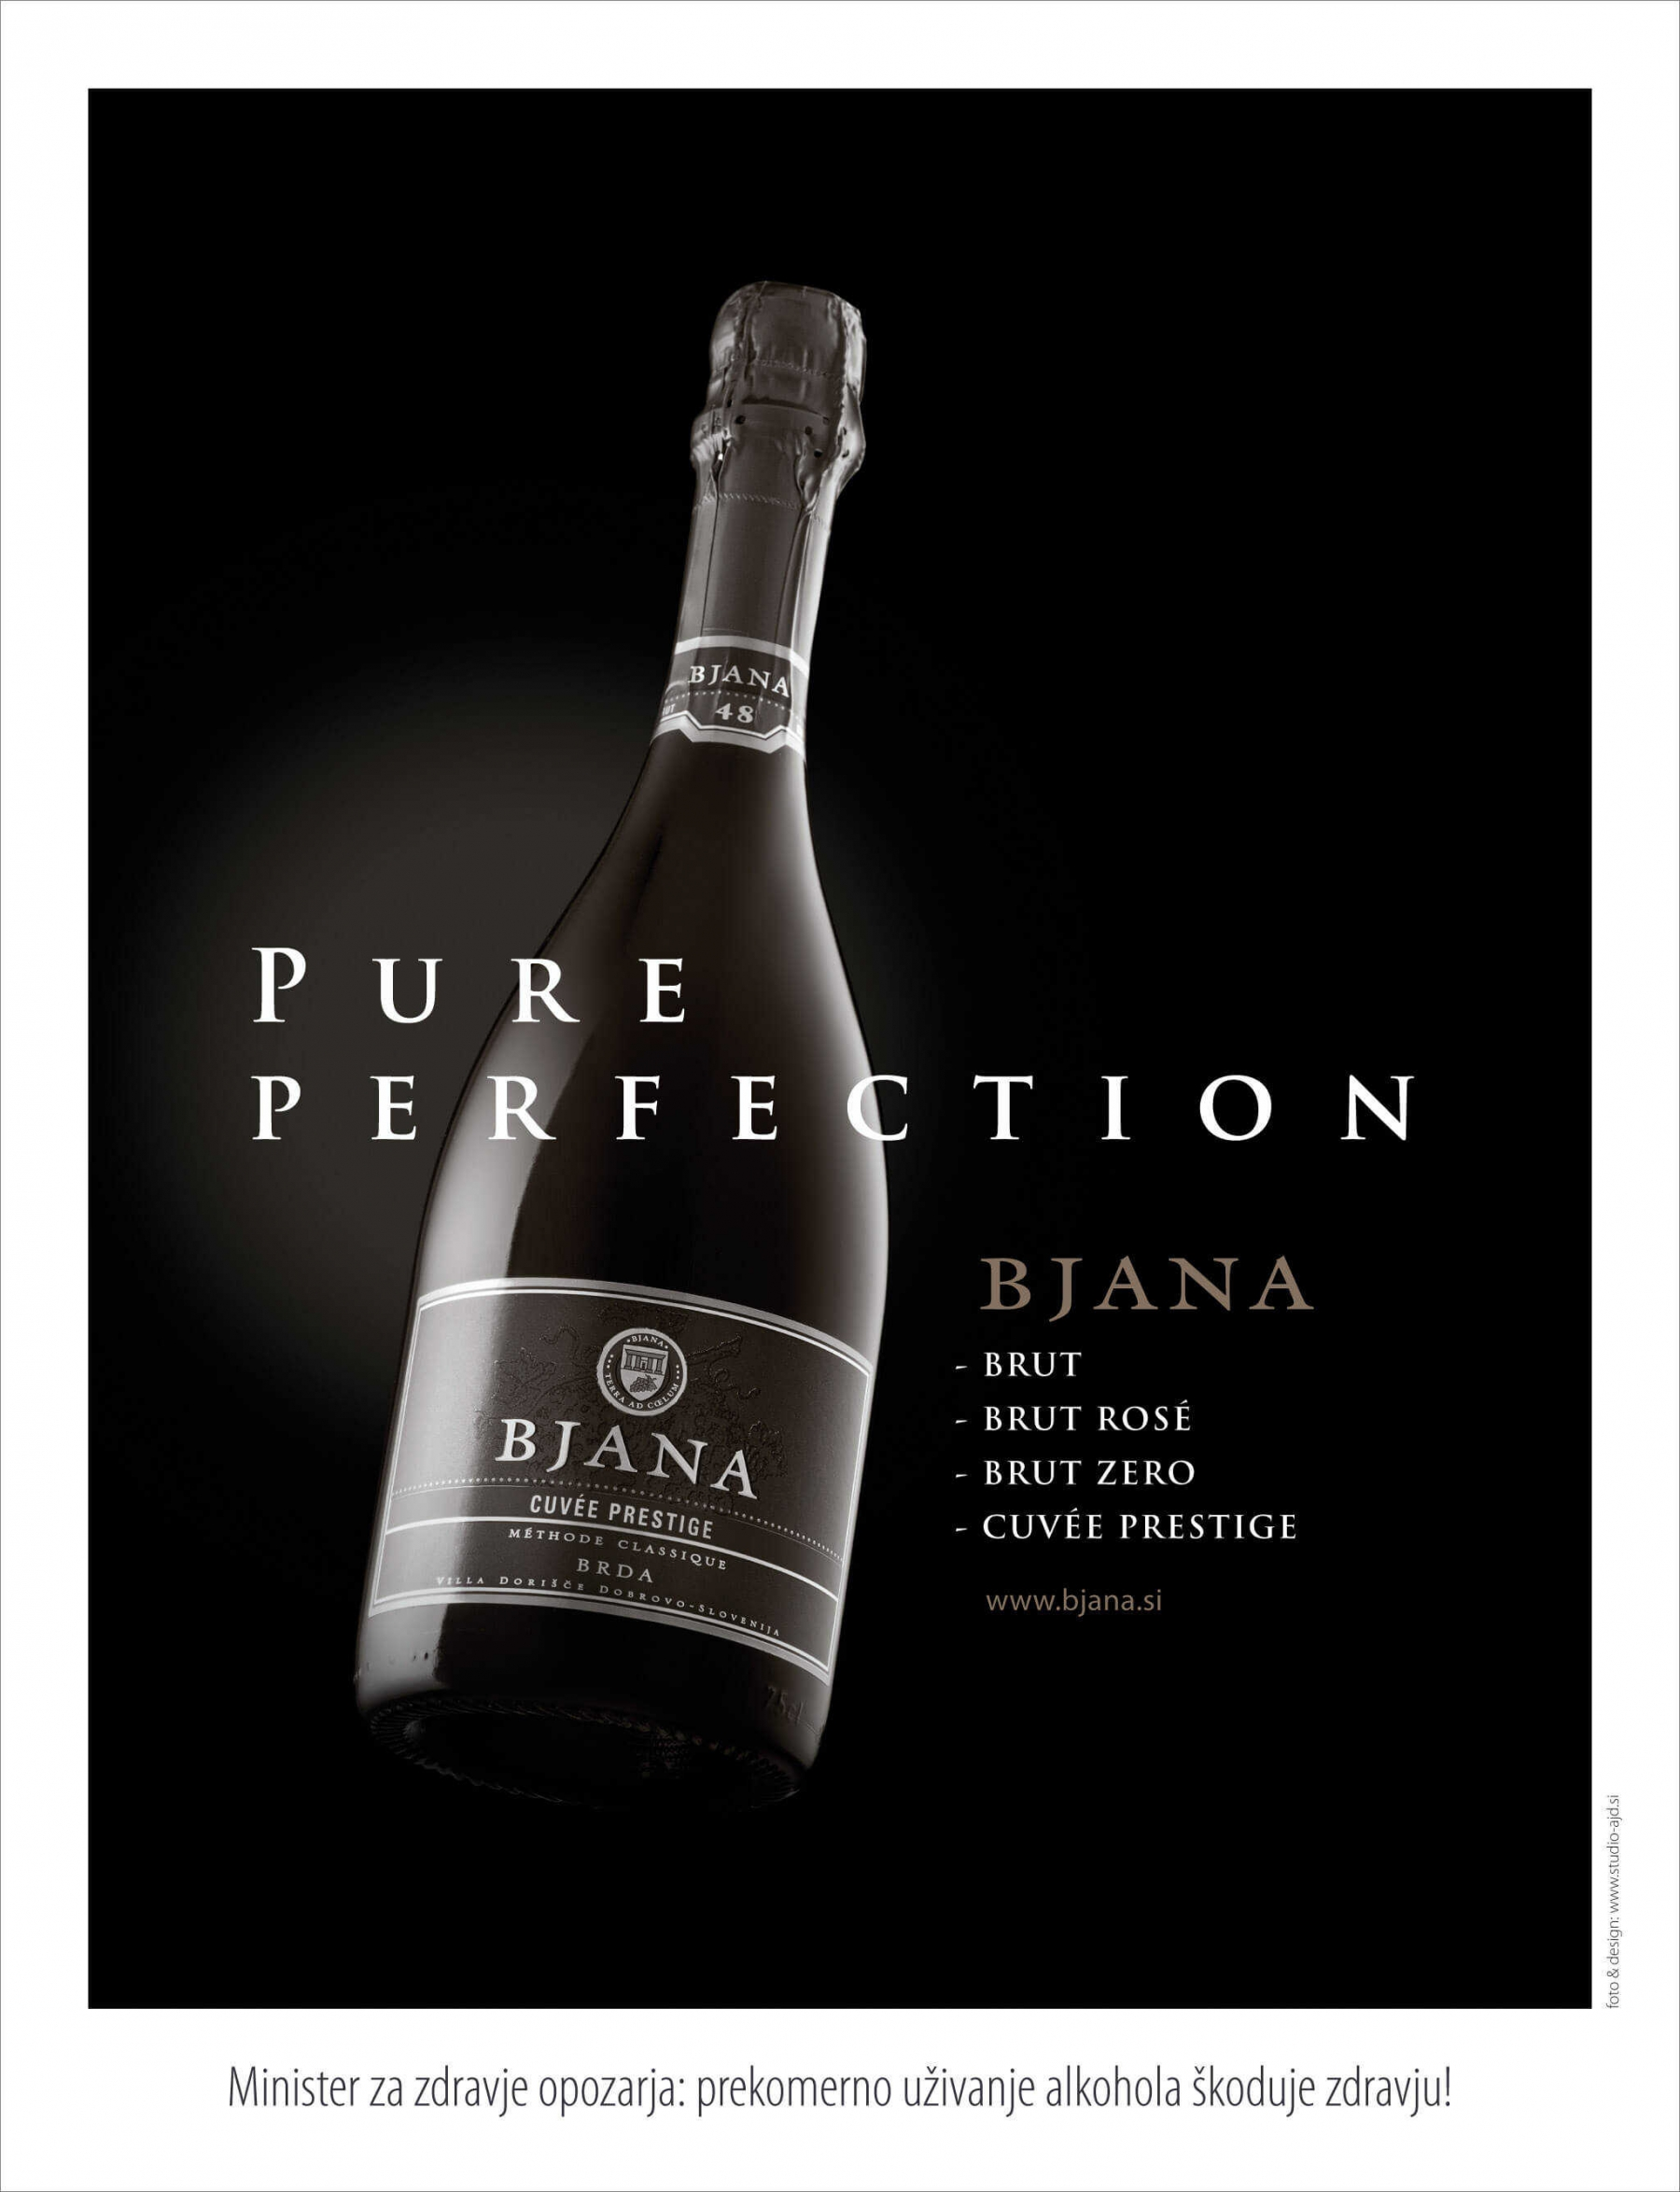 Bjana - oglas Pure perfection